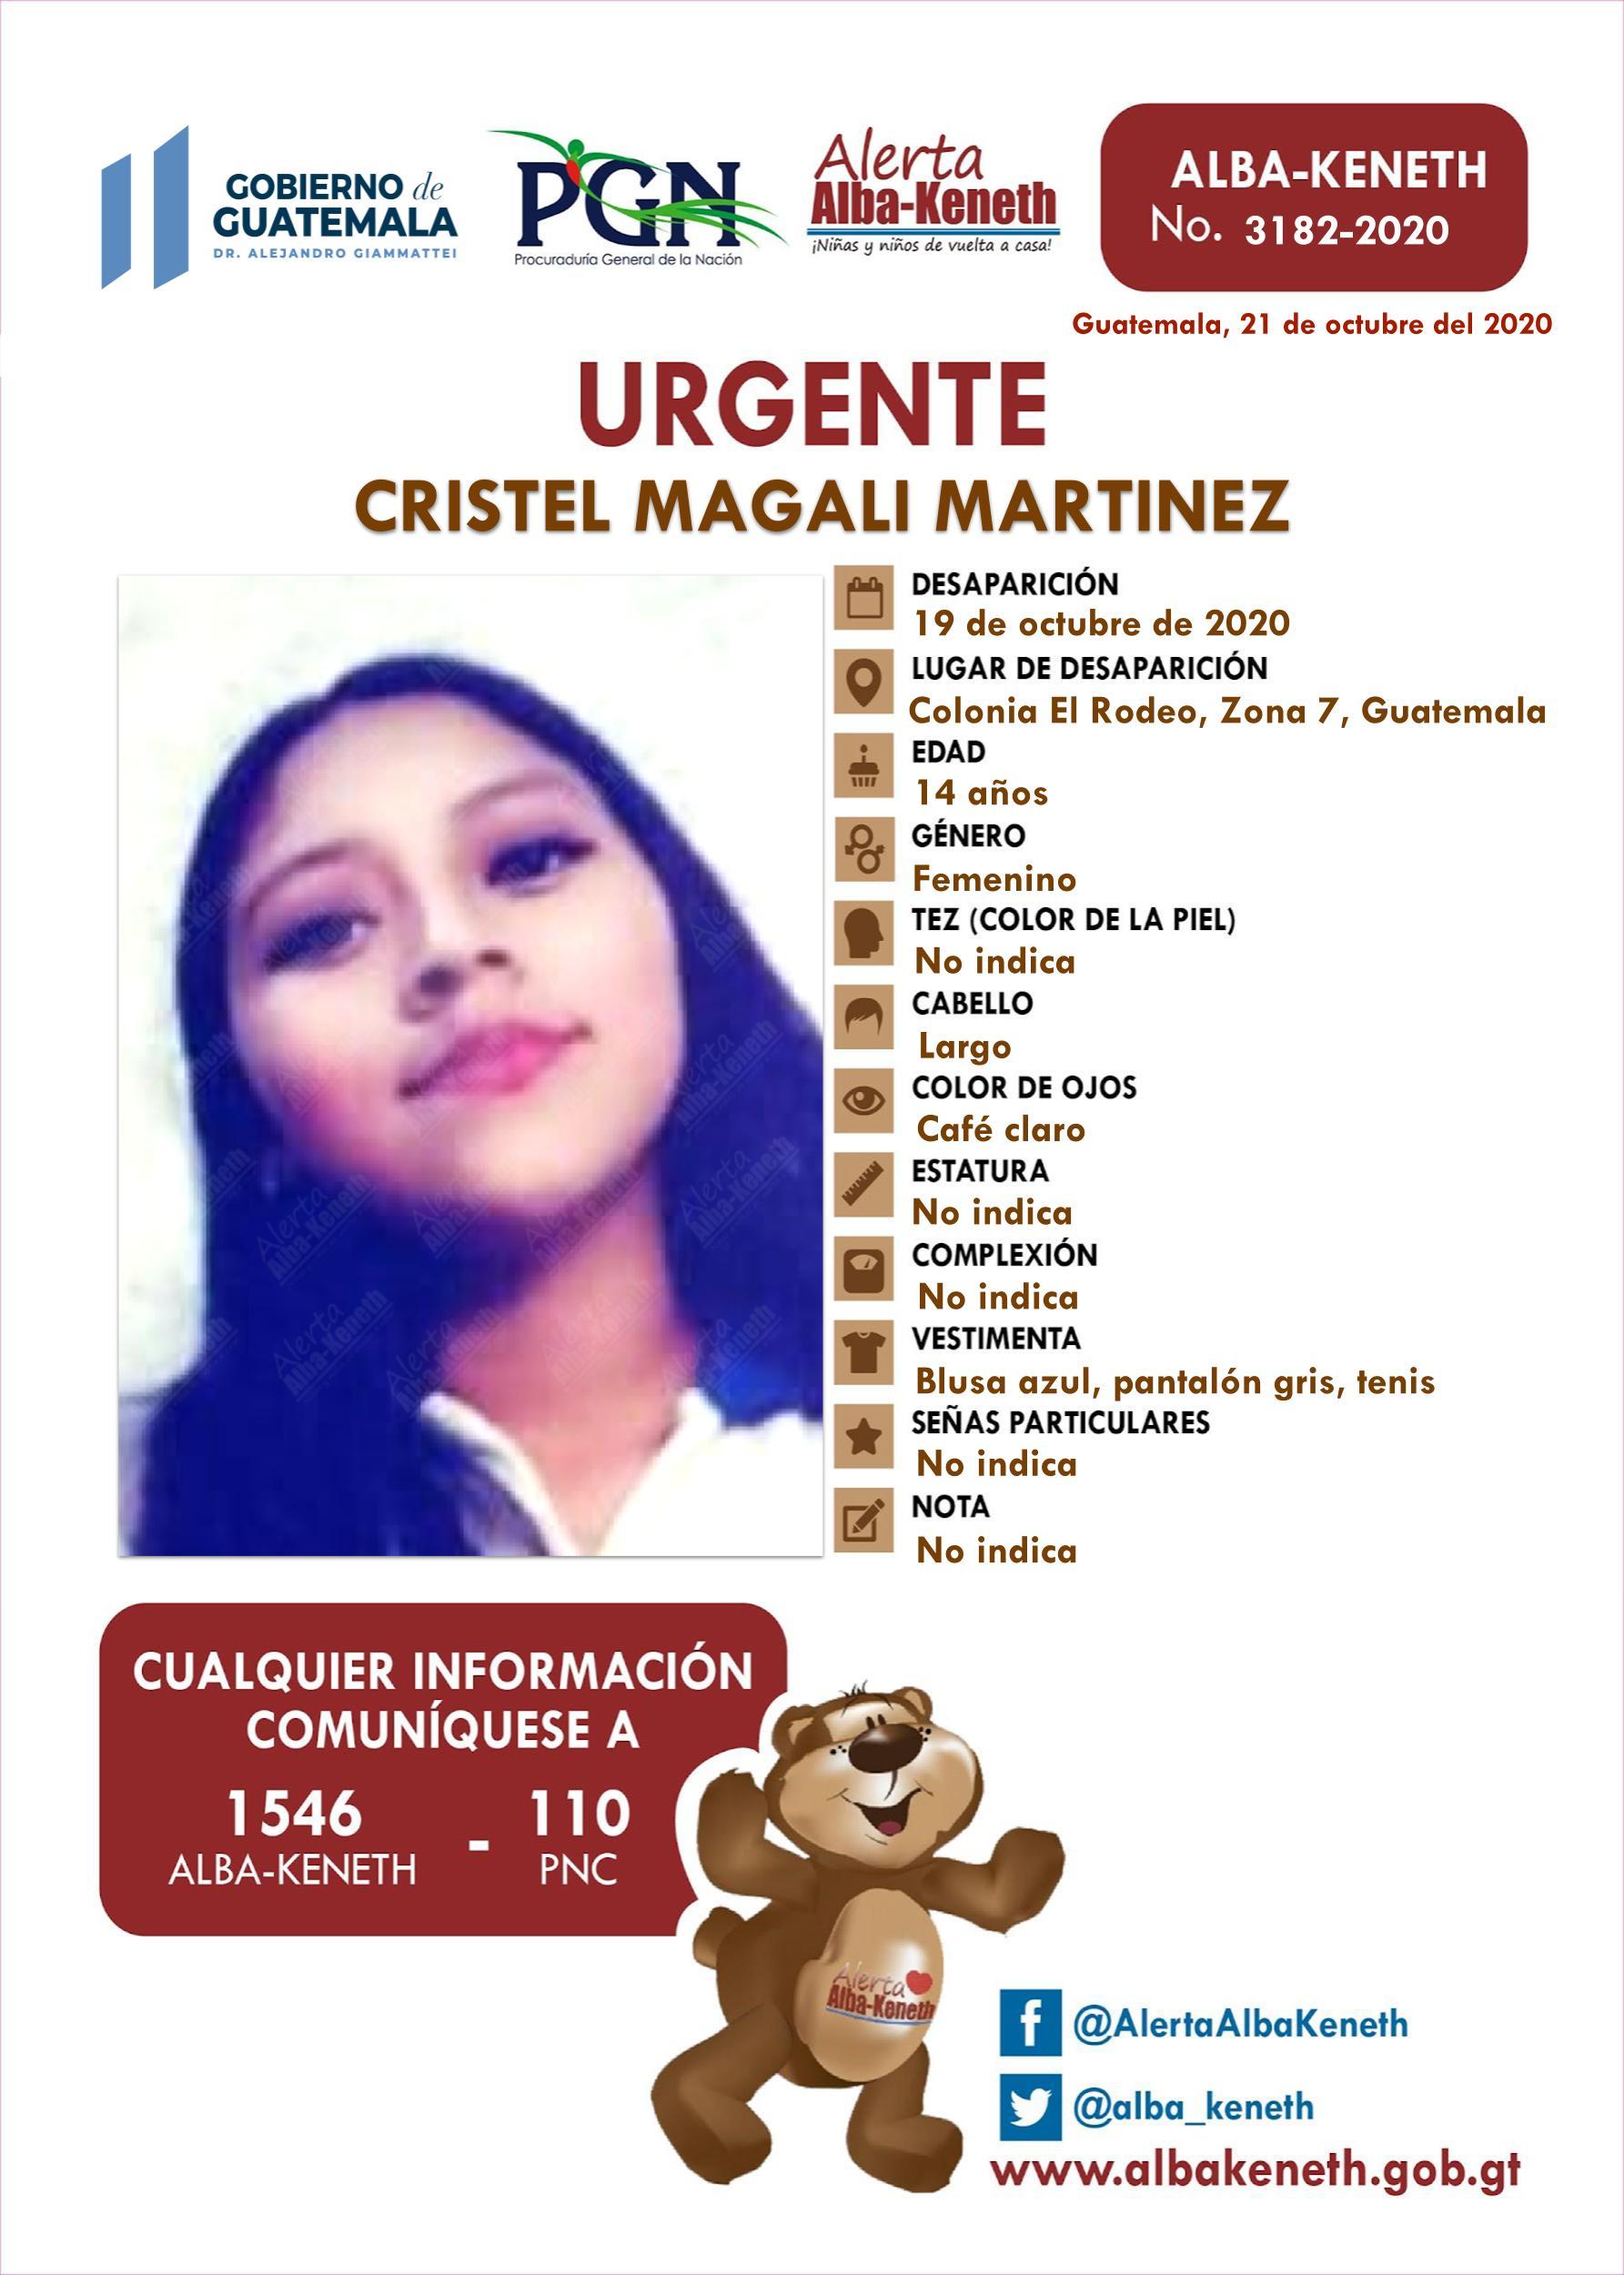 Cristel Magali Martinez